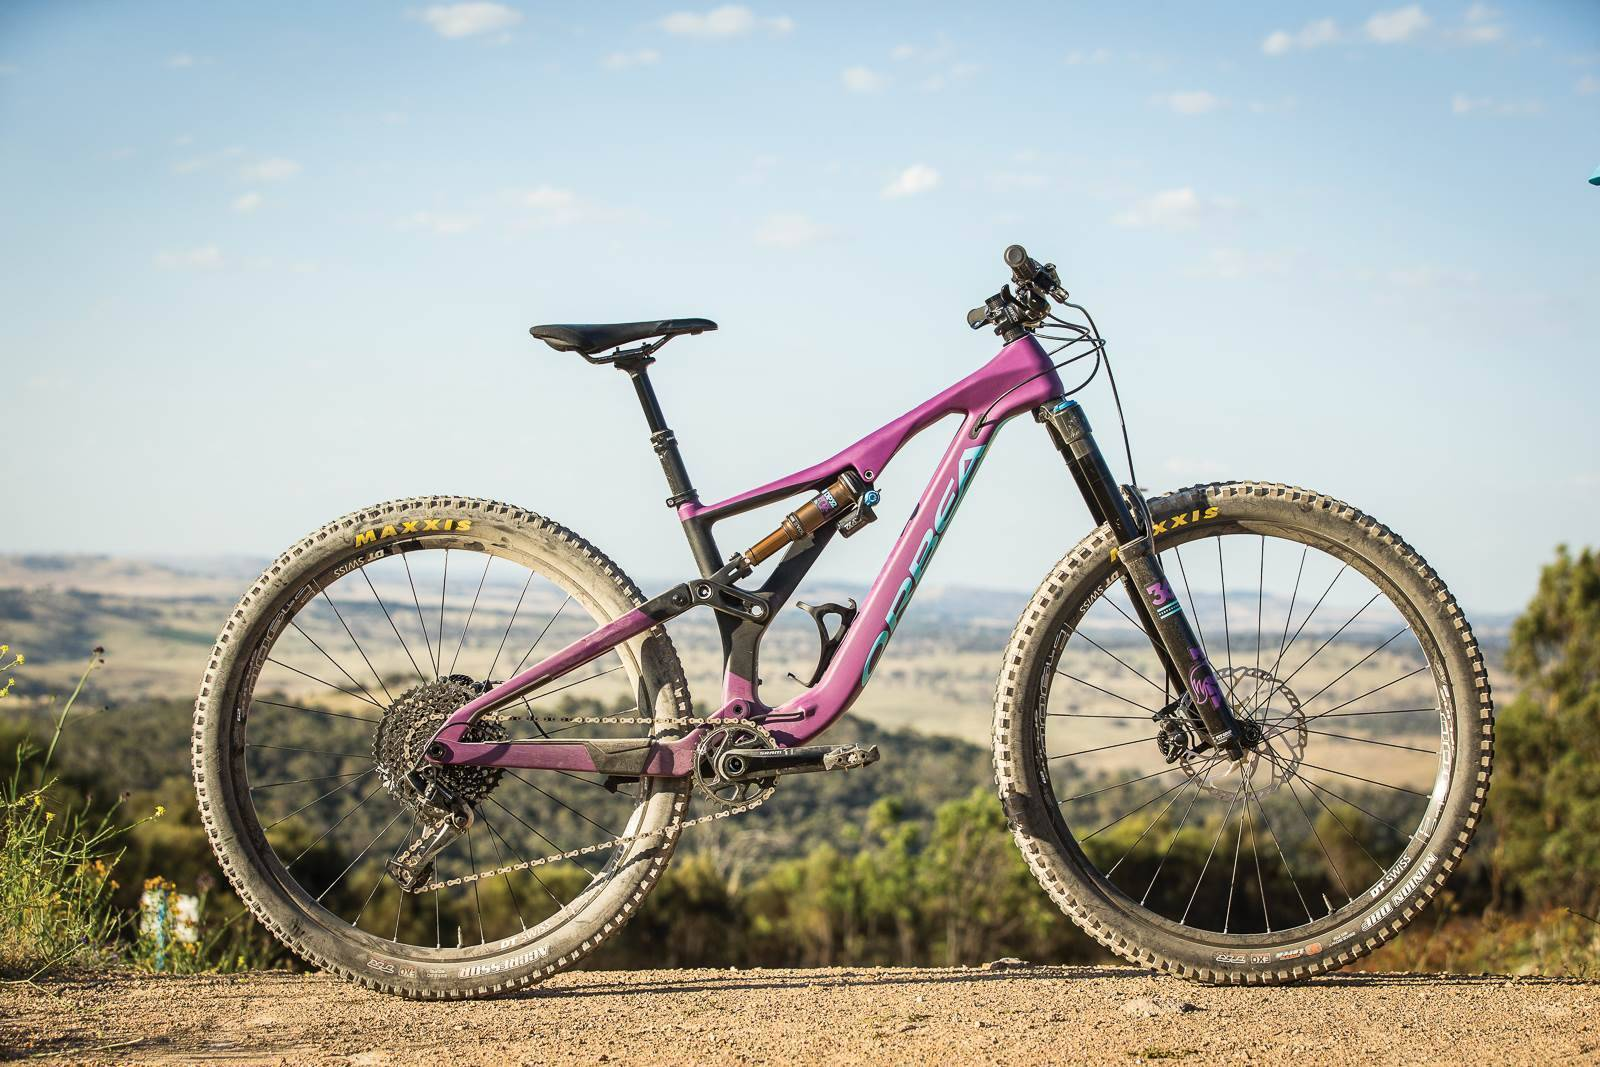 f092110ece8 TESTED: Orbea Rallon M10 - Australian Mountain Bike | The home for  Australian Mountain Bikes